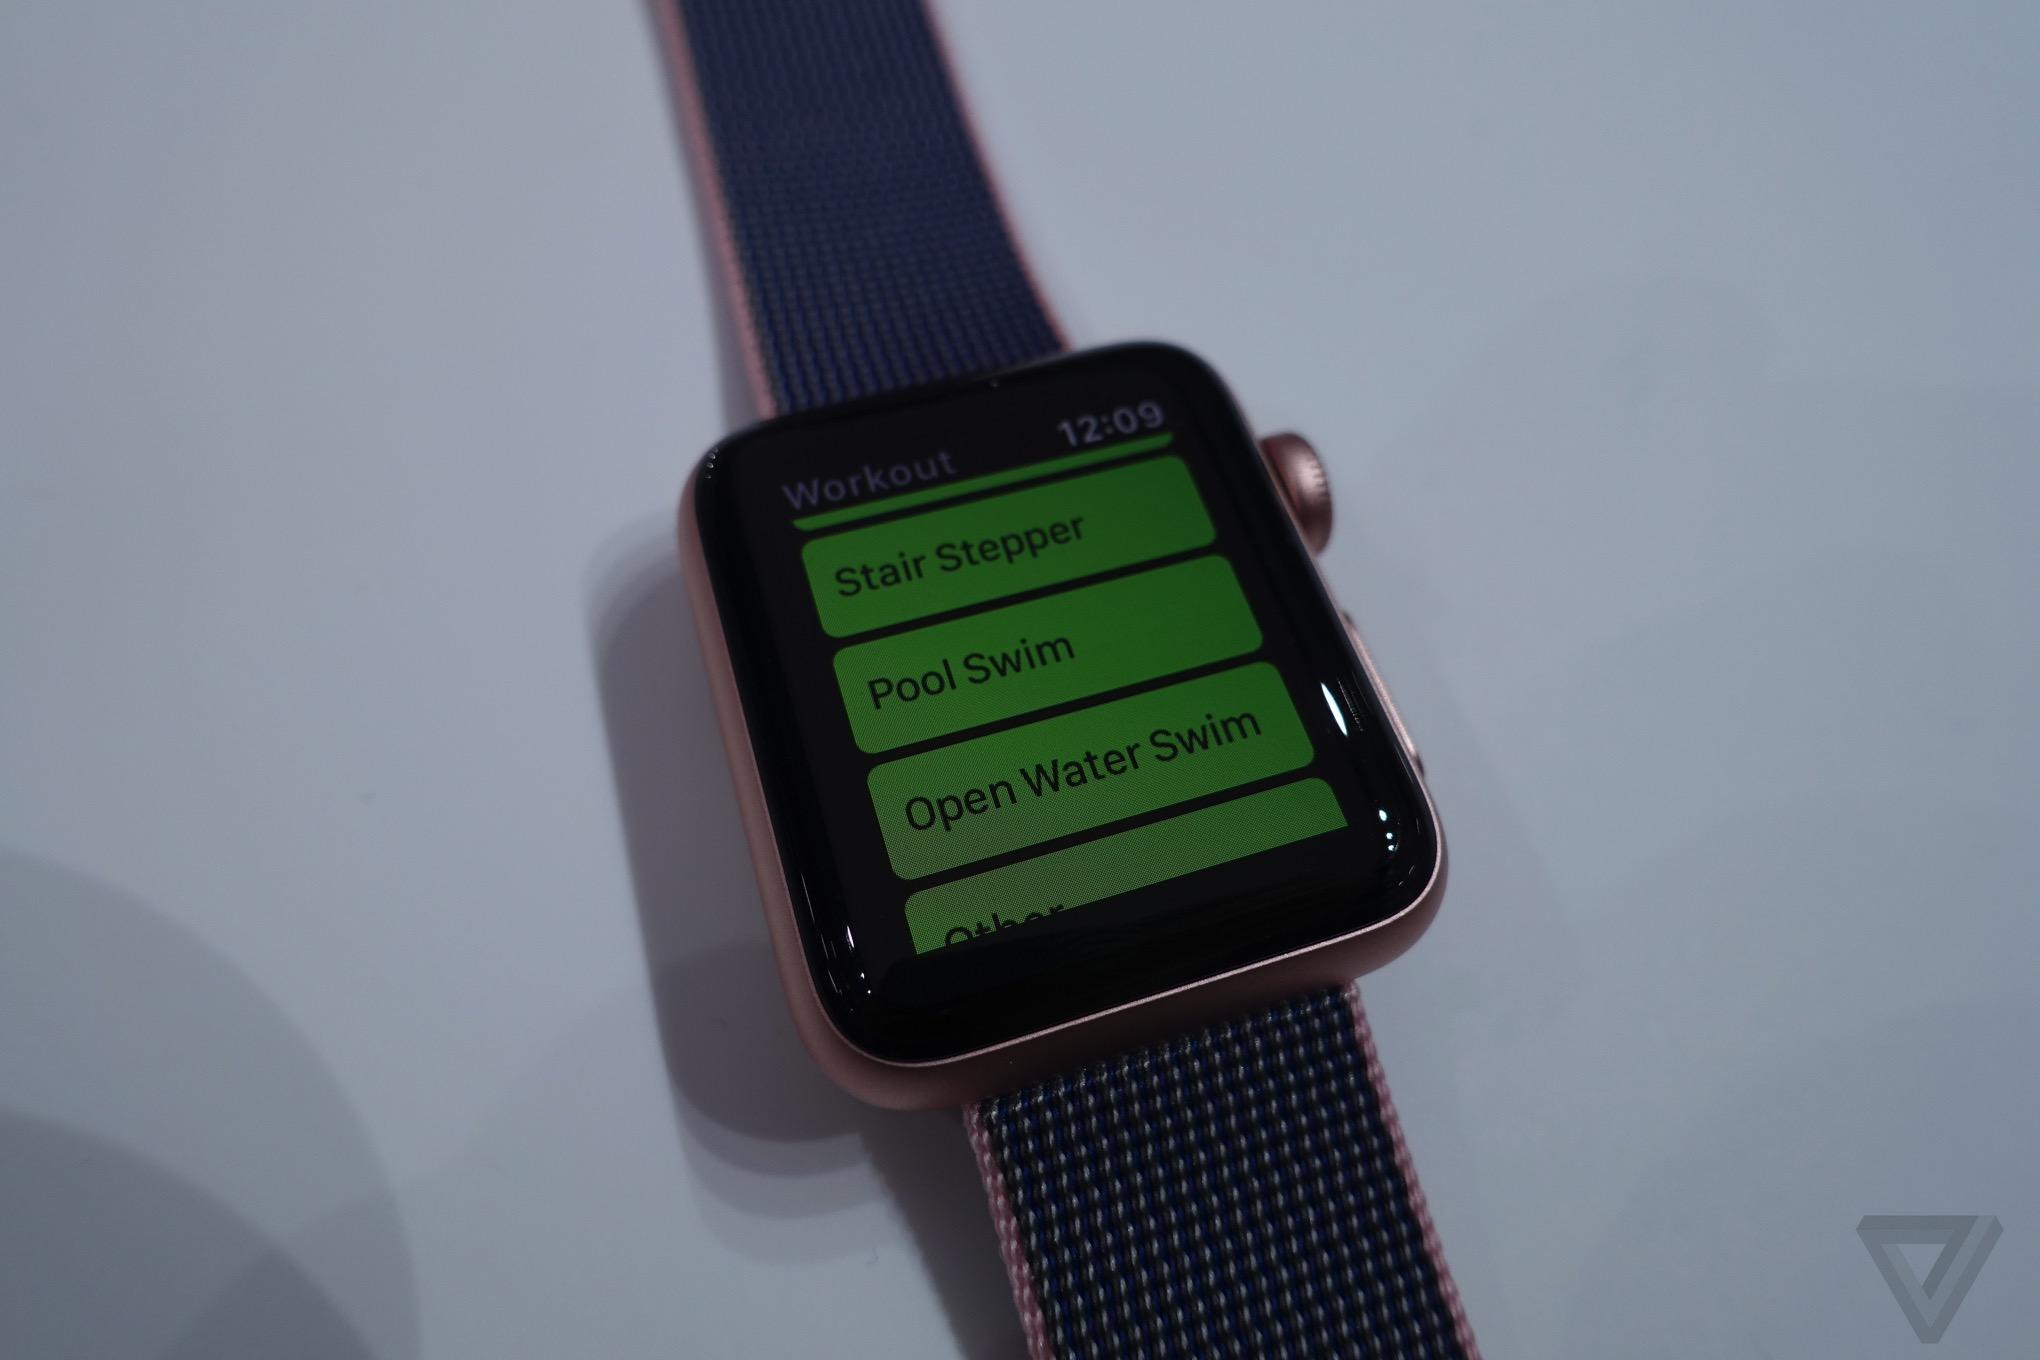 apple nike watch series 2. apple-watch-series-2 apple nike watch series 2